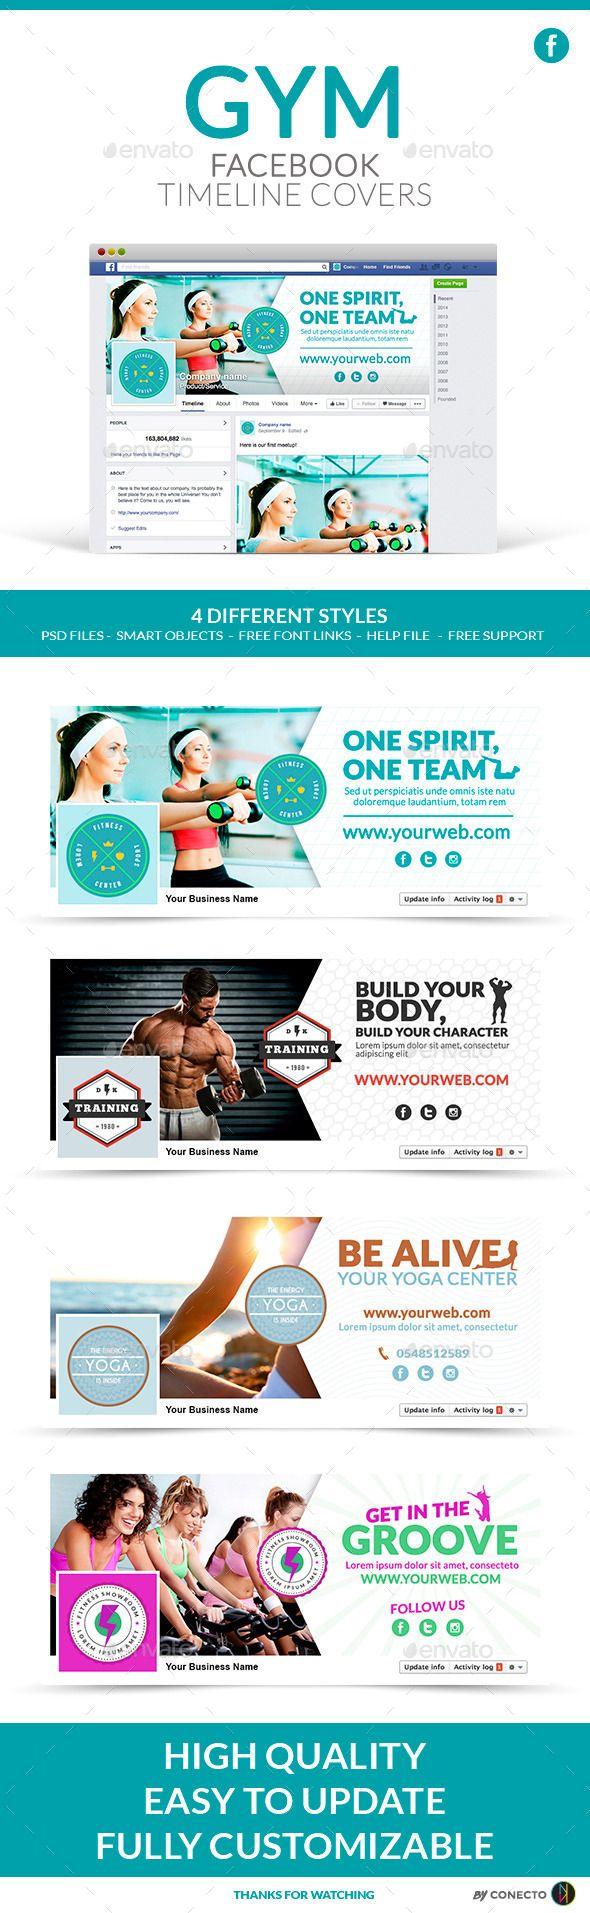 Facebook Timeline Covers  Gym  Timeline Covers Facebook